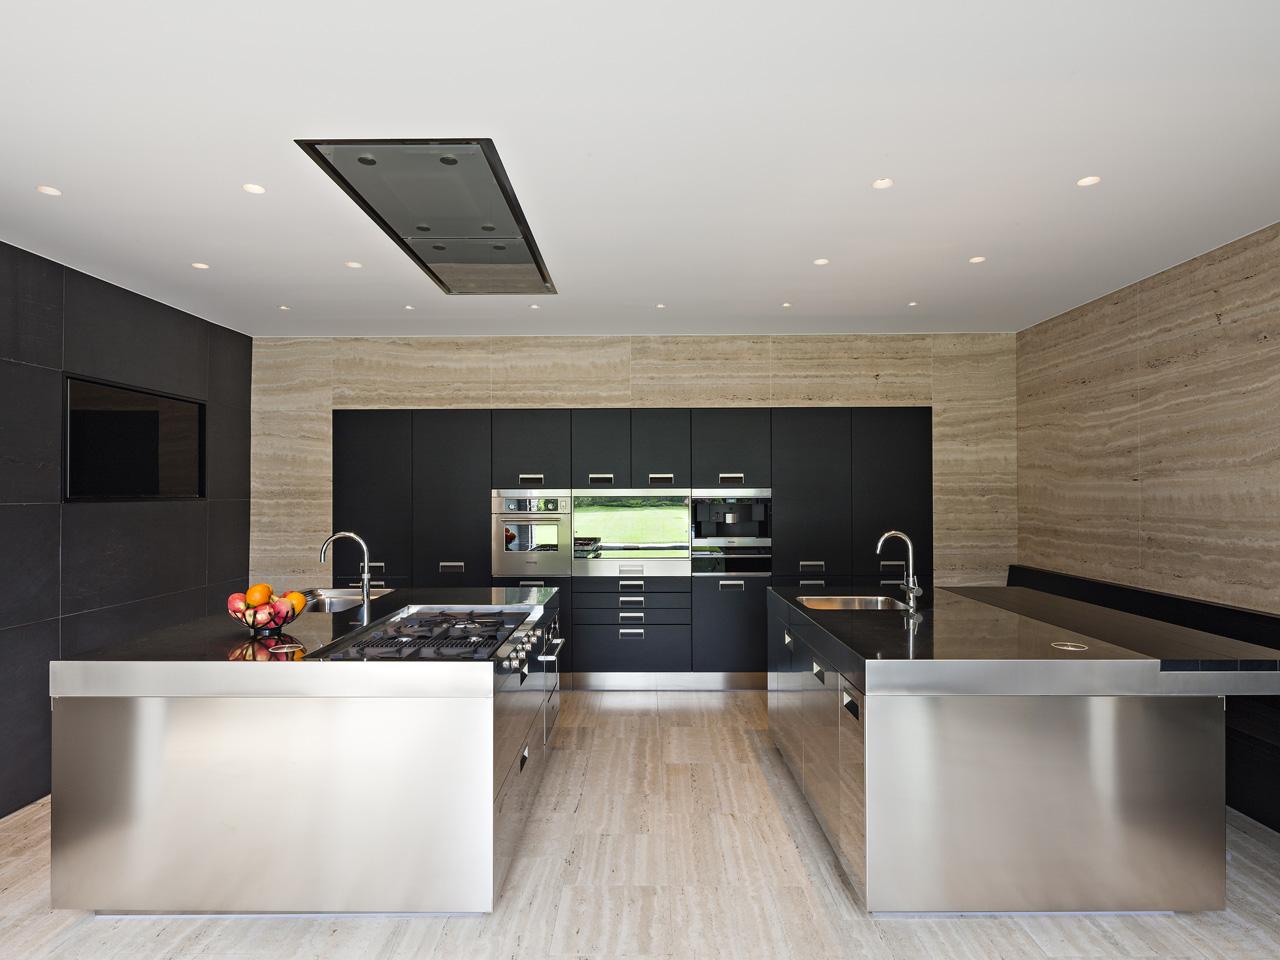 Più spazio in una cucina minimal: 8 consigli di design